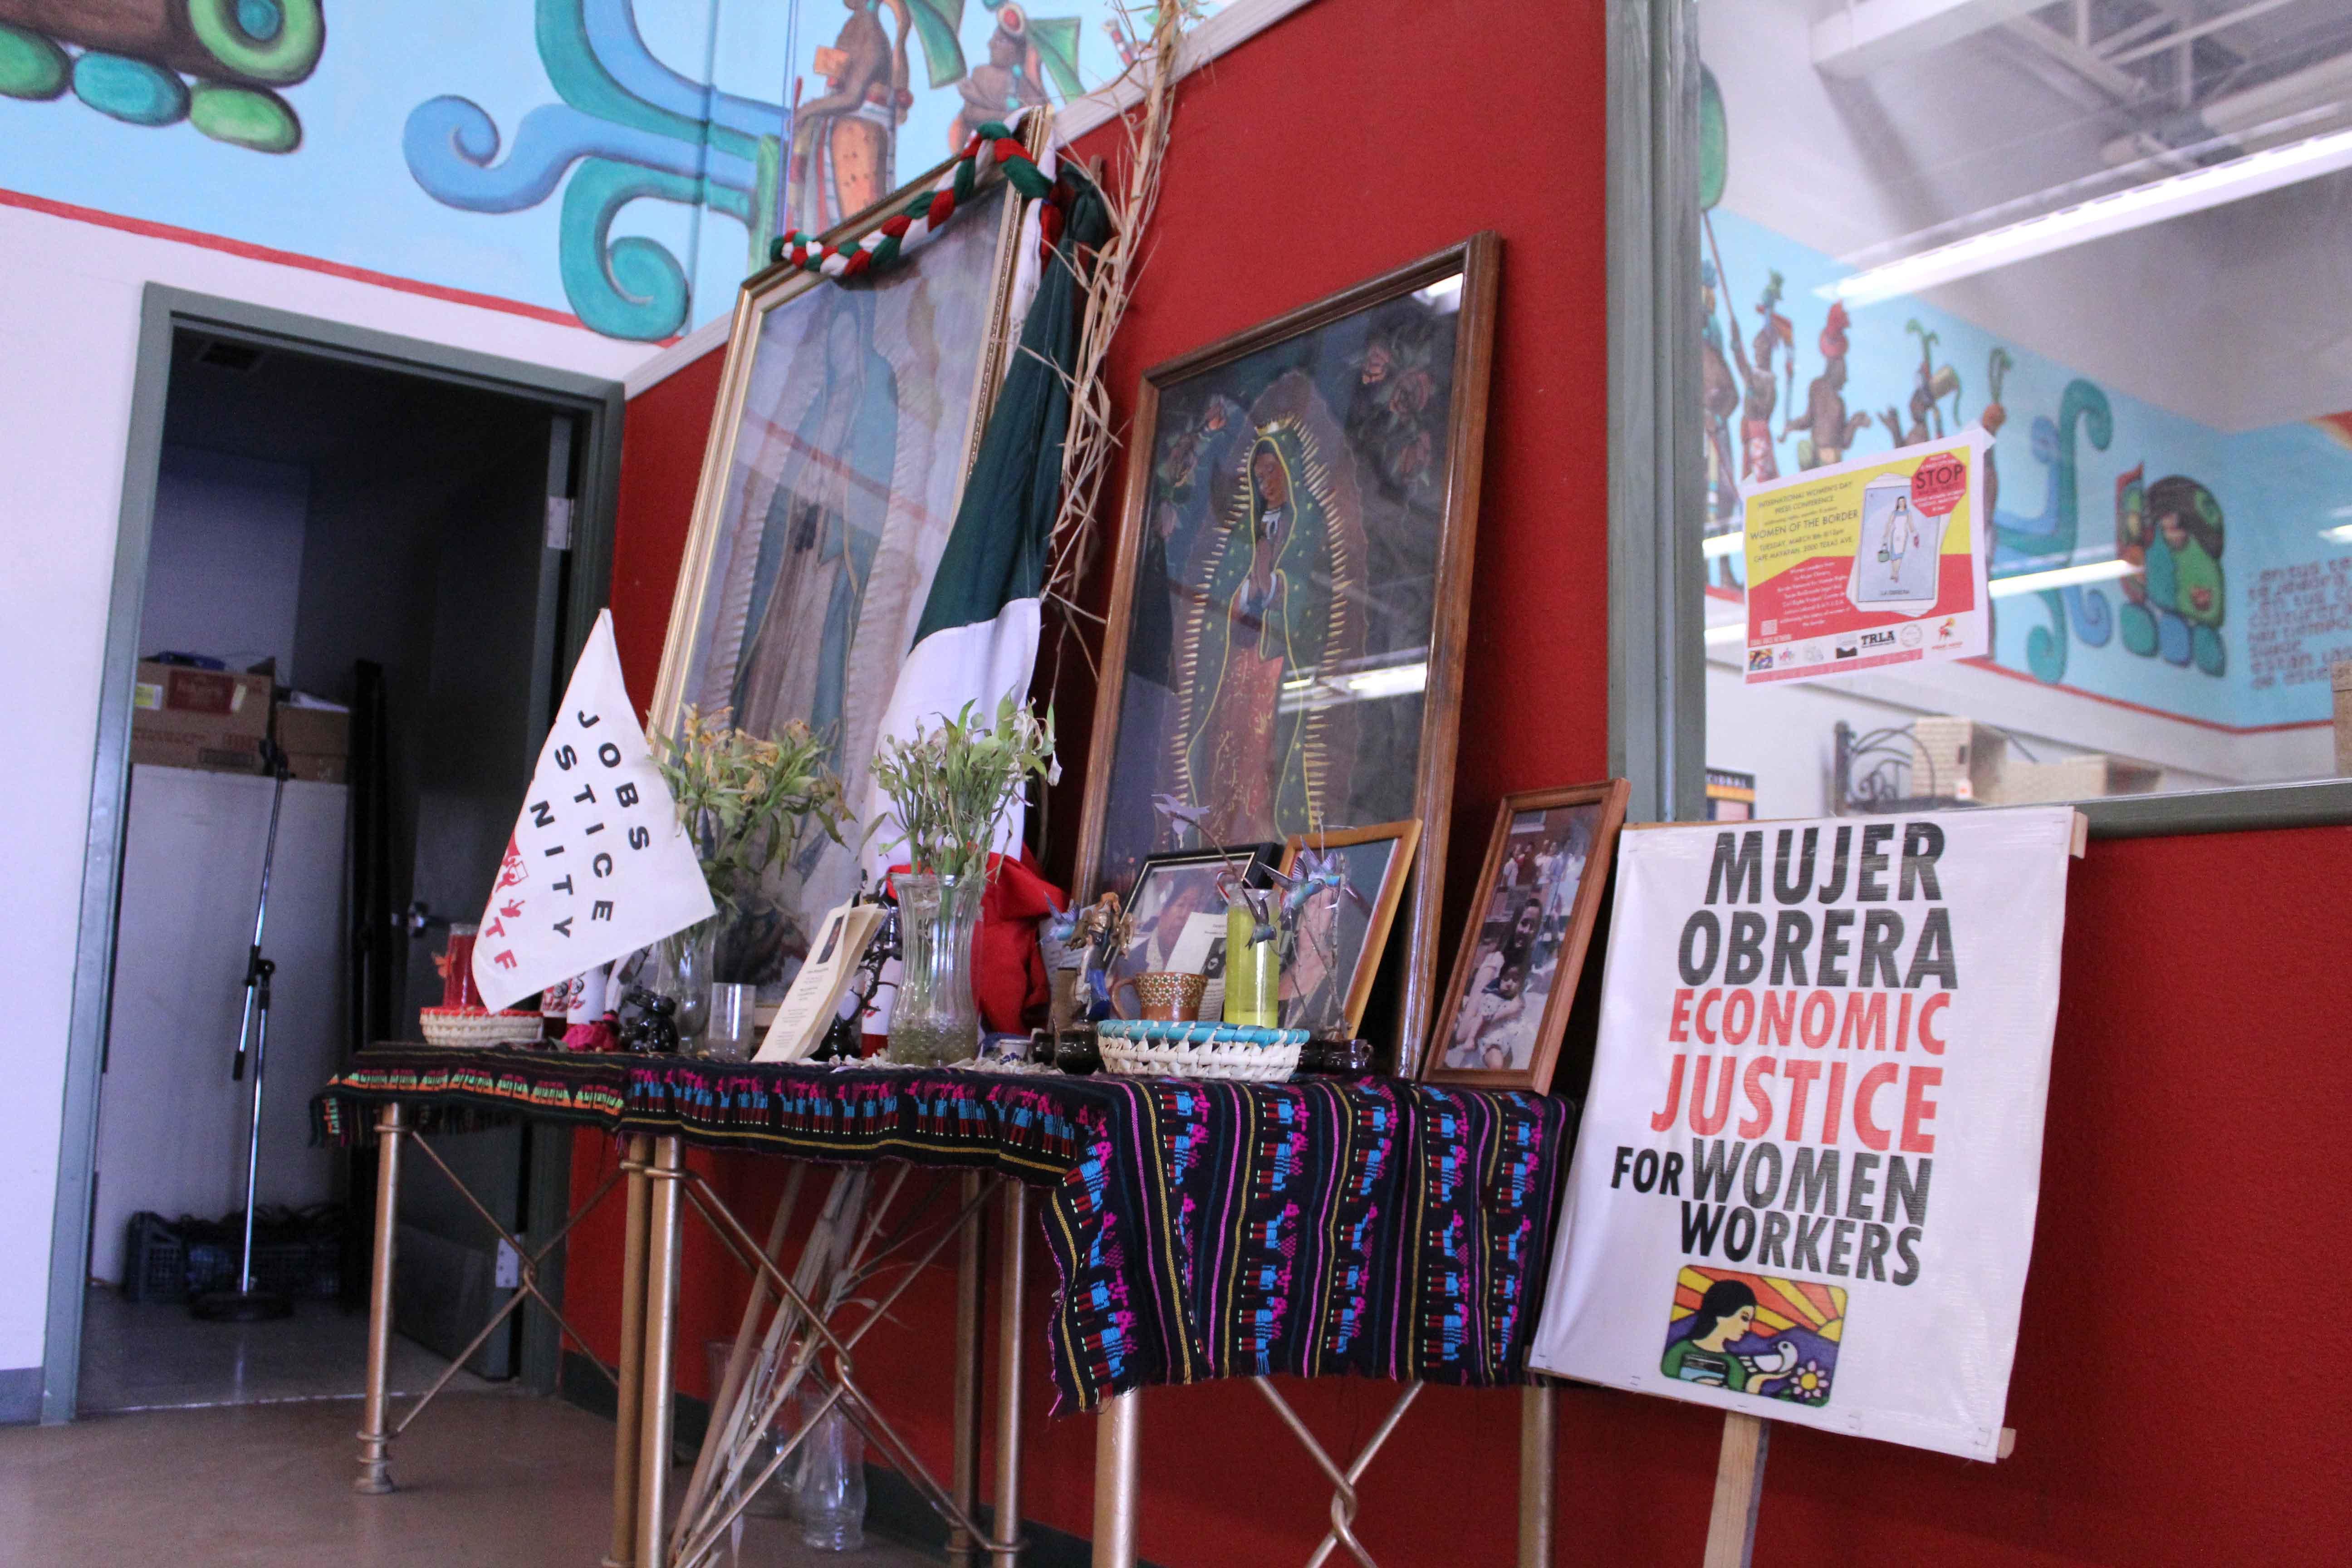 Café Mayapan, located at 2000 Texas Ave is the home of La Mujer Obrera, a non-profit organization run by women.